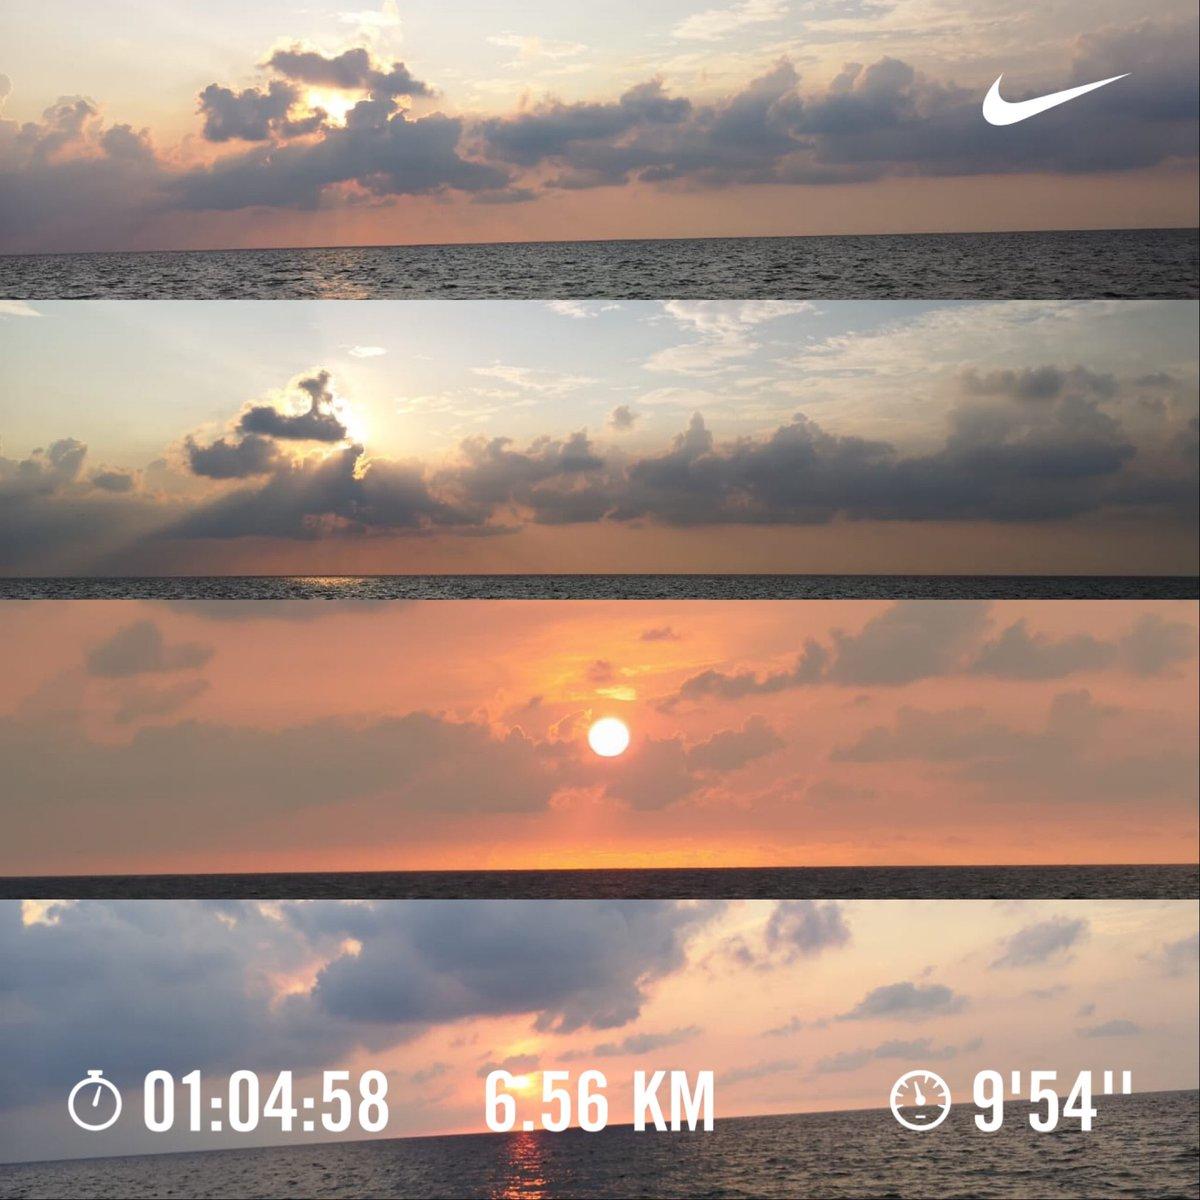 Oh yeah!! @yoelegicorrer1 #YoElegiCorrer #RunningMan #runnersofinstagram #runners  #FelizSabado #FelizSabadoATodos #SabadoDeGanarSeguidores #SaturdayVibes #SaturdayNight #JustDoIt https://t.co/ESpTU5UlmN